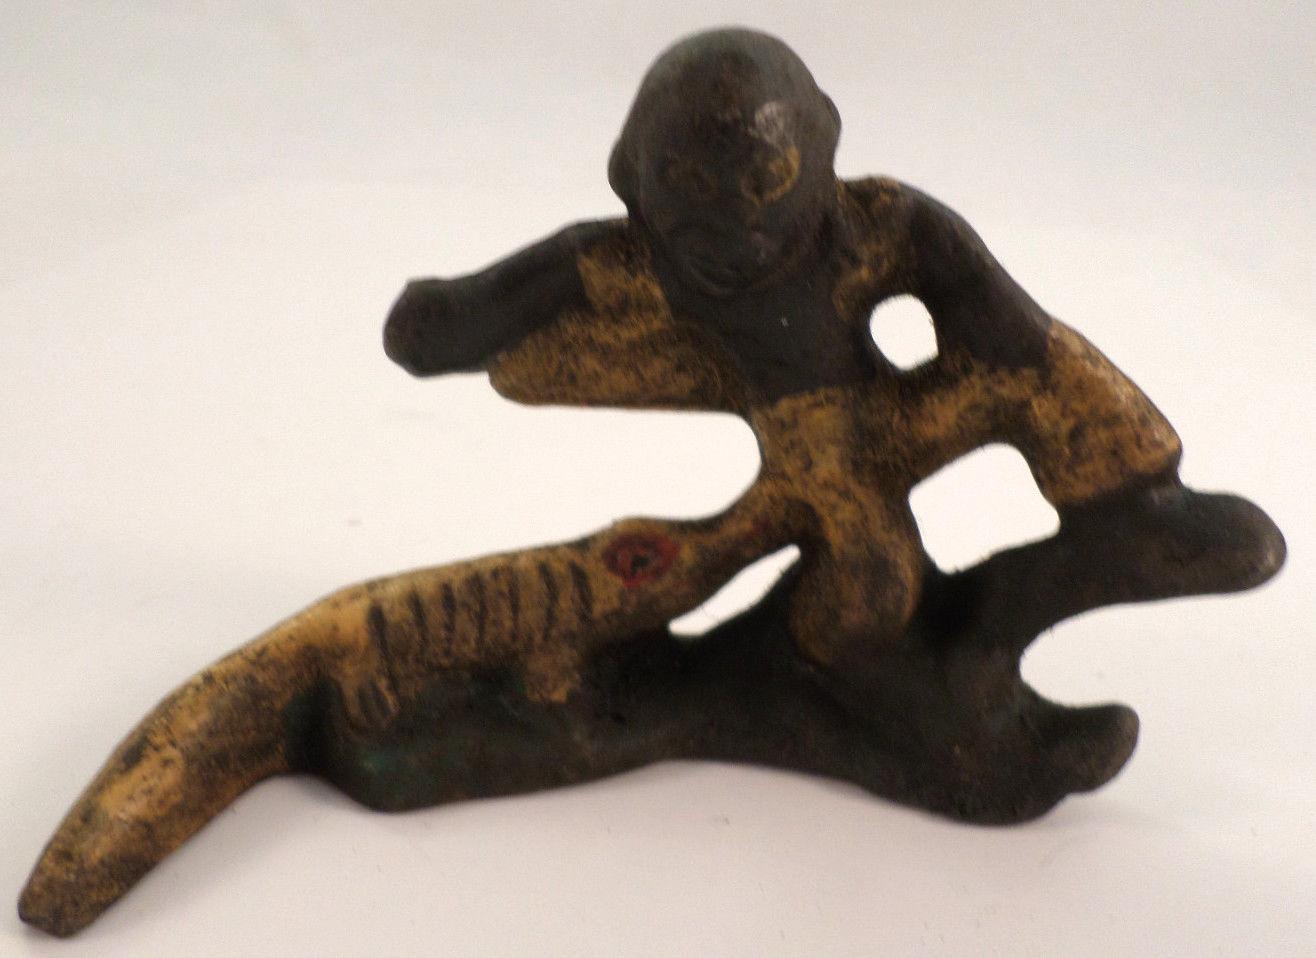 Cast iron metal bottle opener black americana gator boy alligator nipping ebay - Alligator bottle opener ...